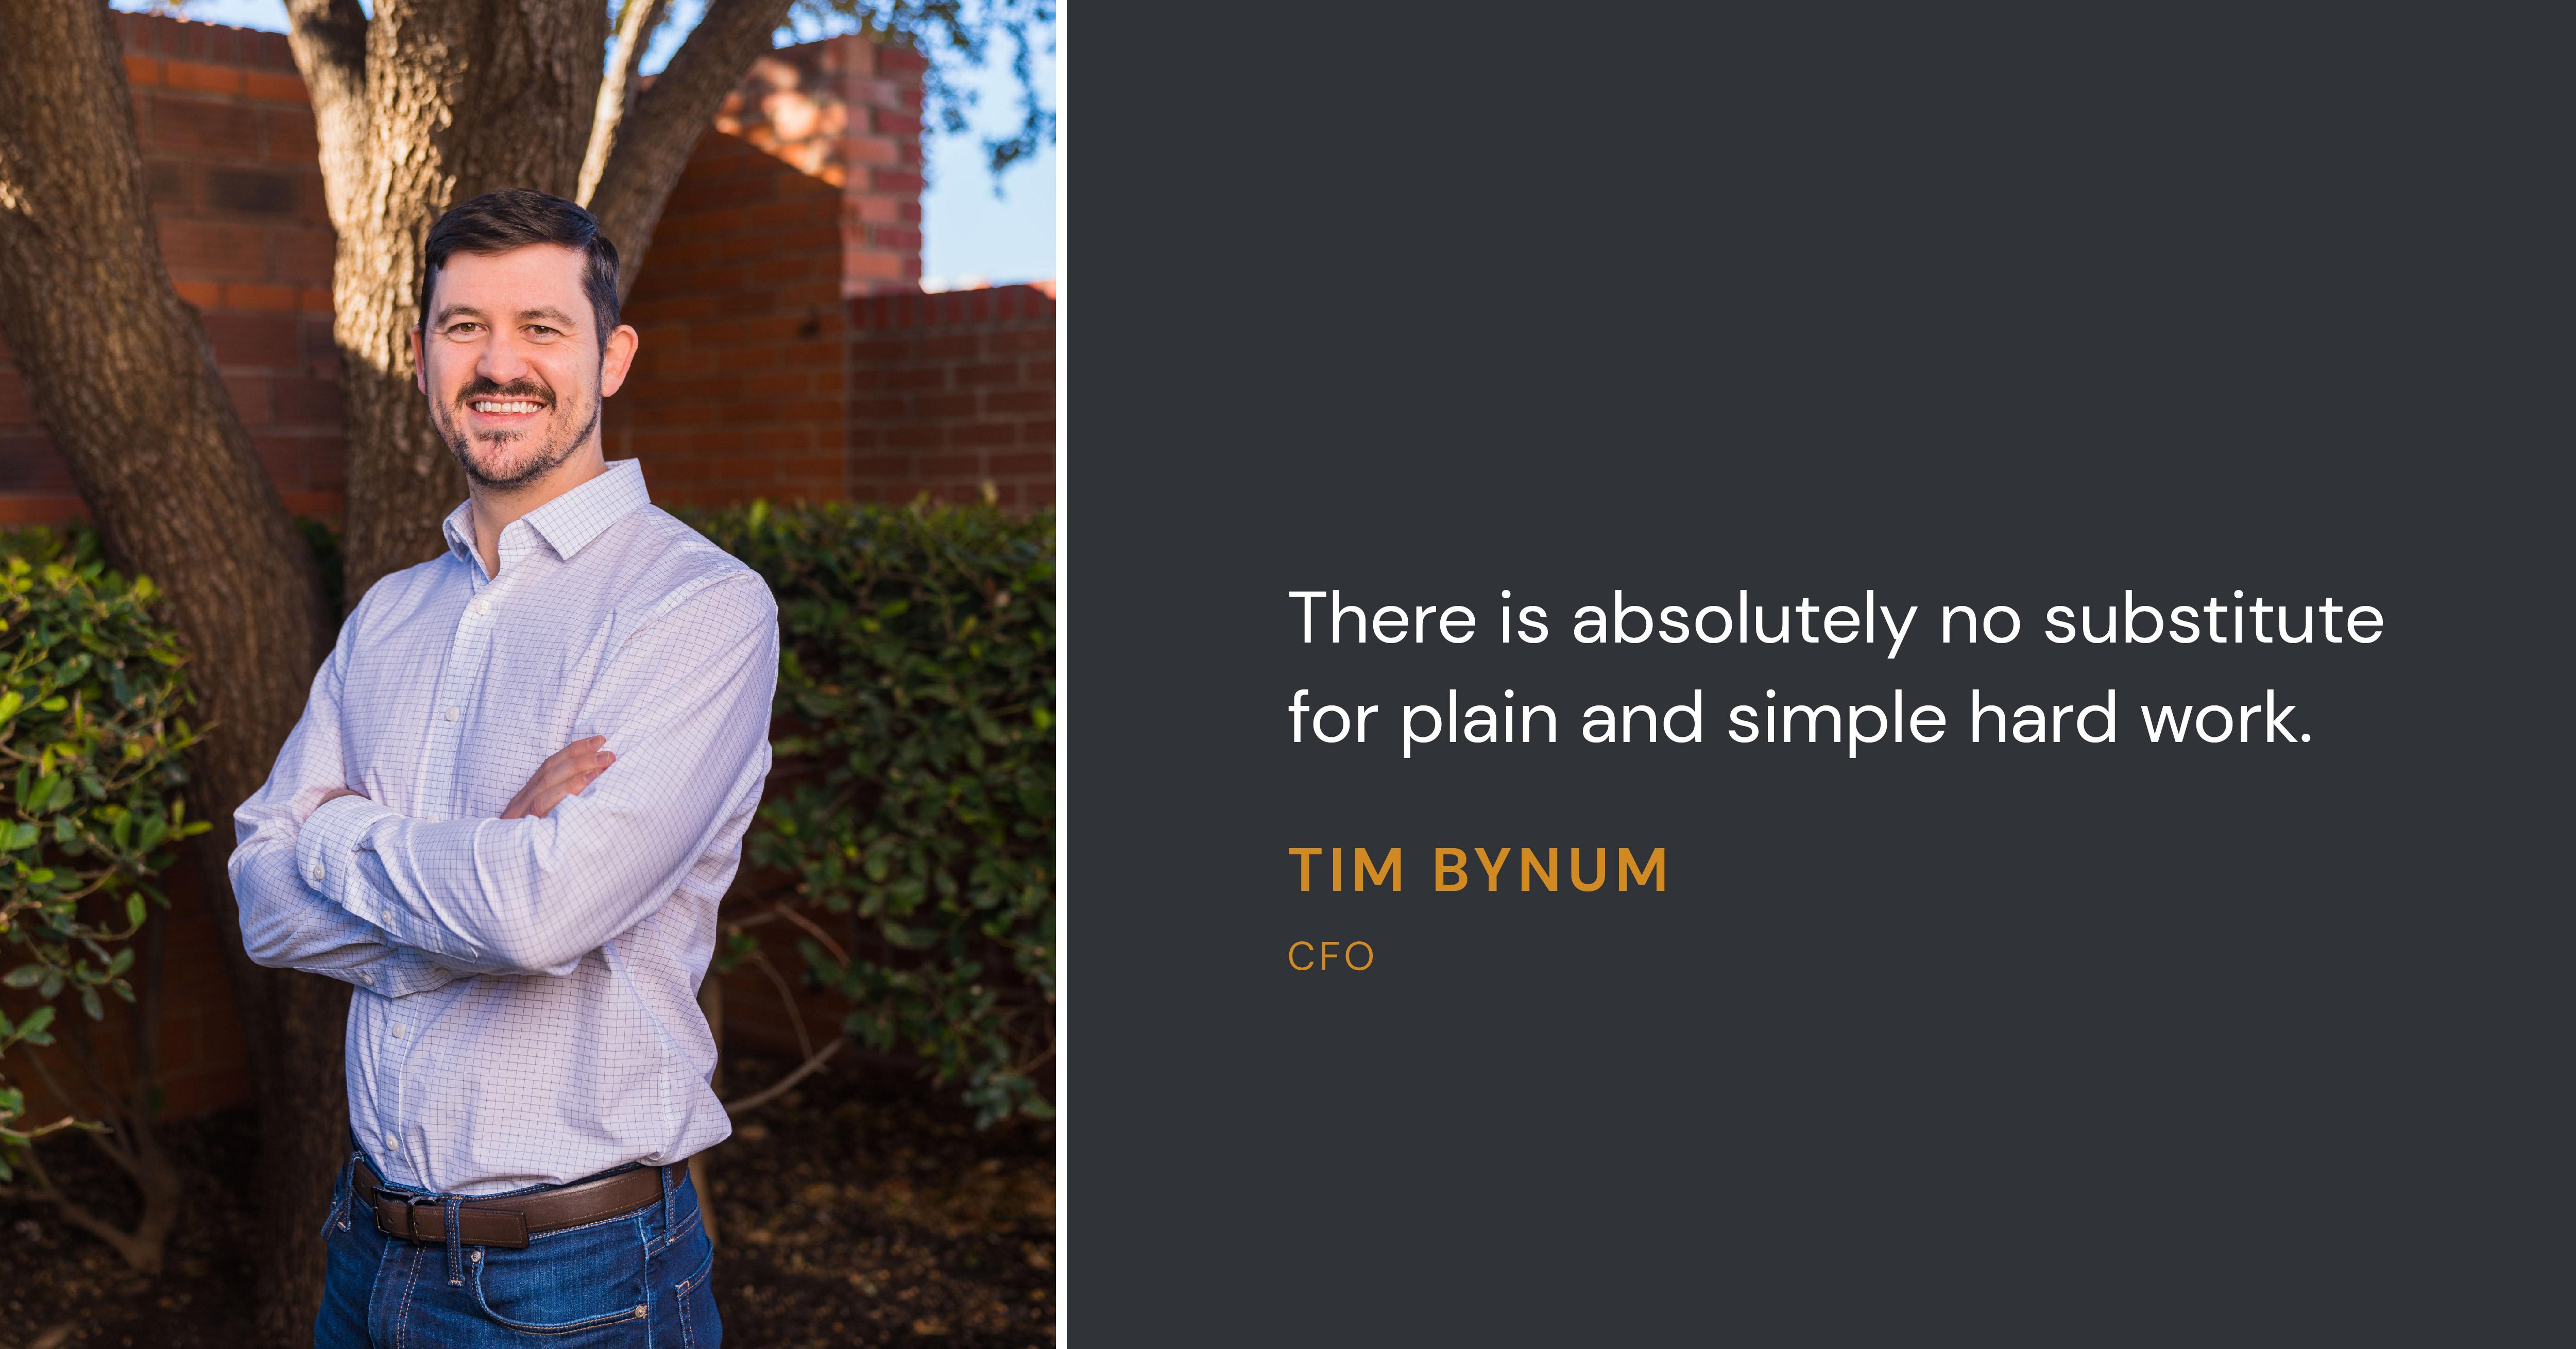 Tim-Bynum-CFO